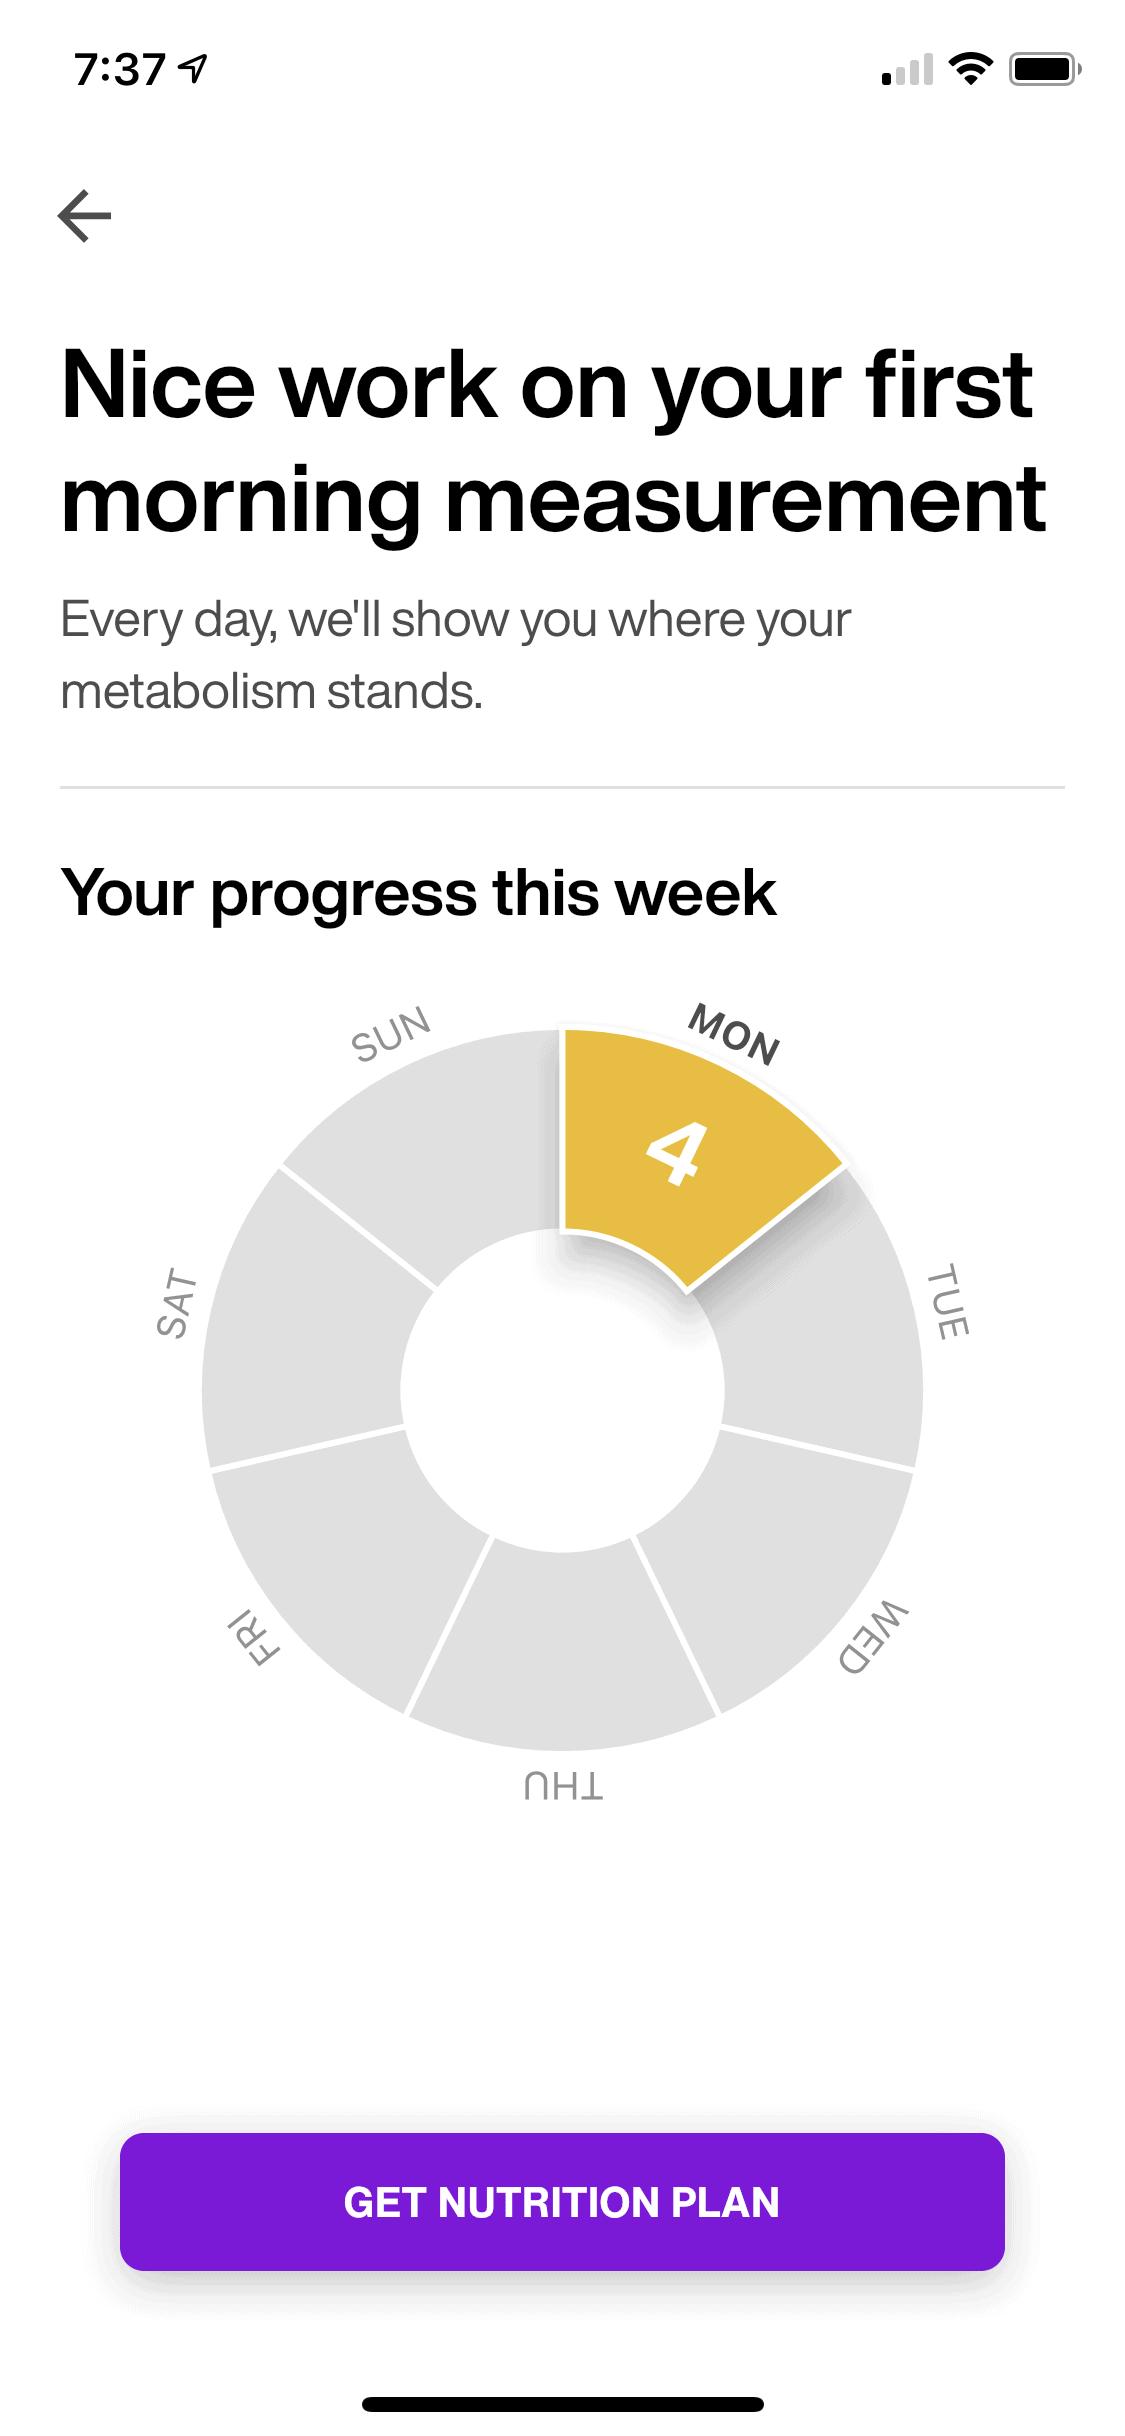 This Week's progress